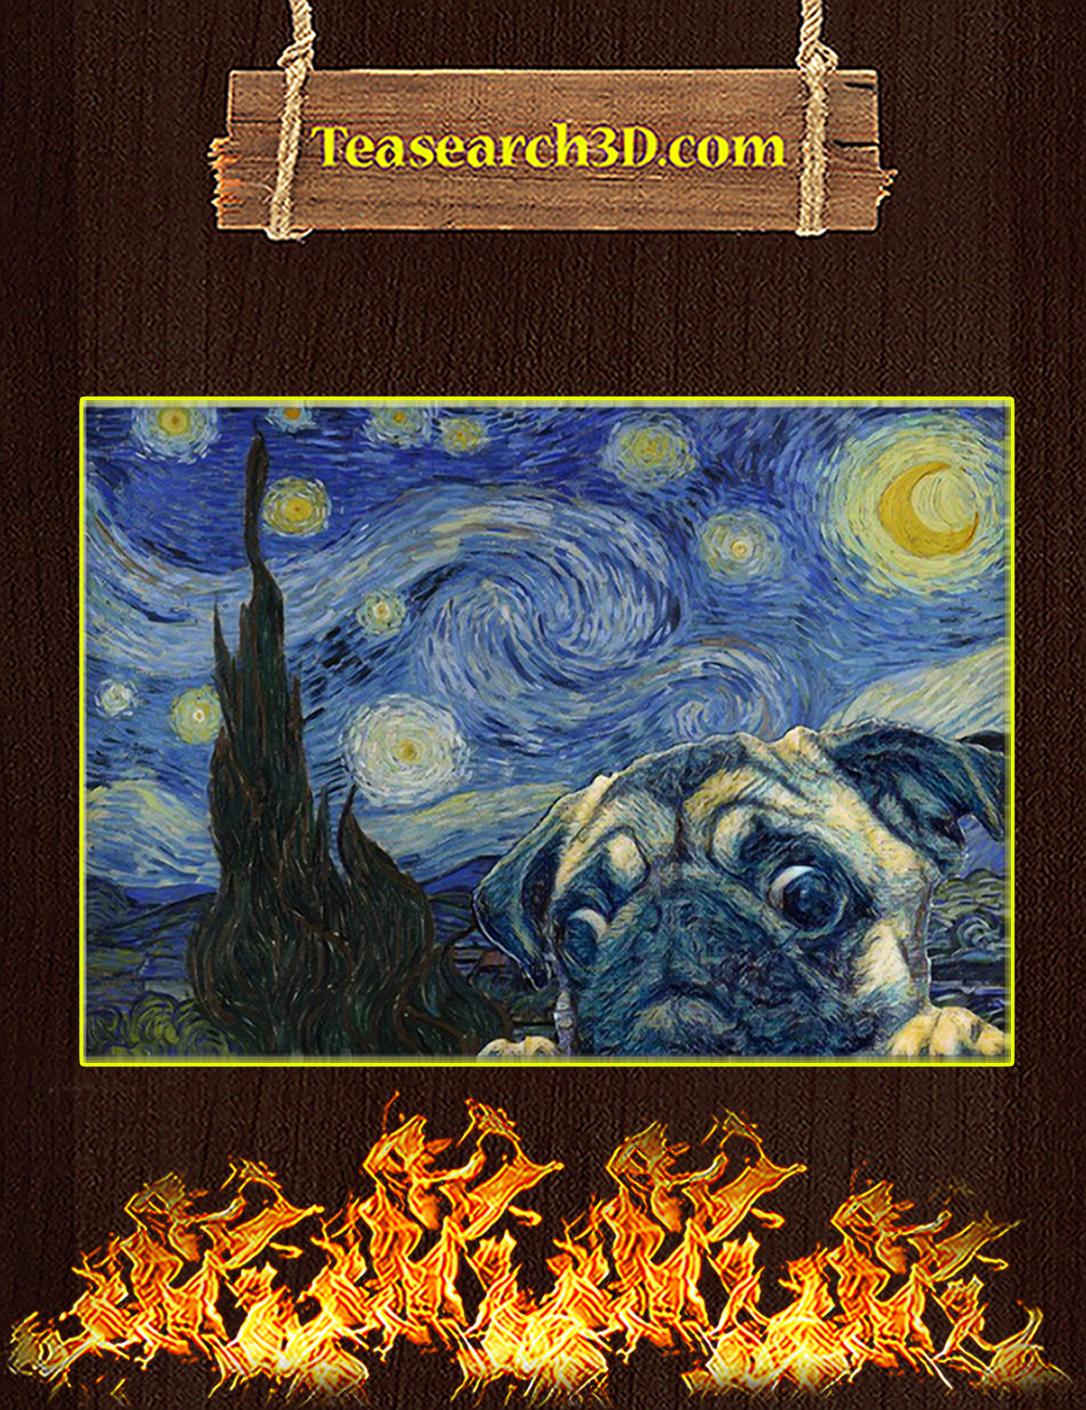 Pug starry night van gogh poster A2